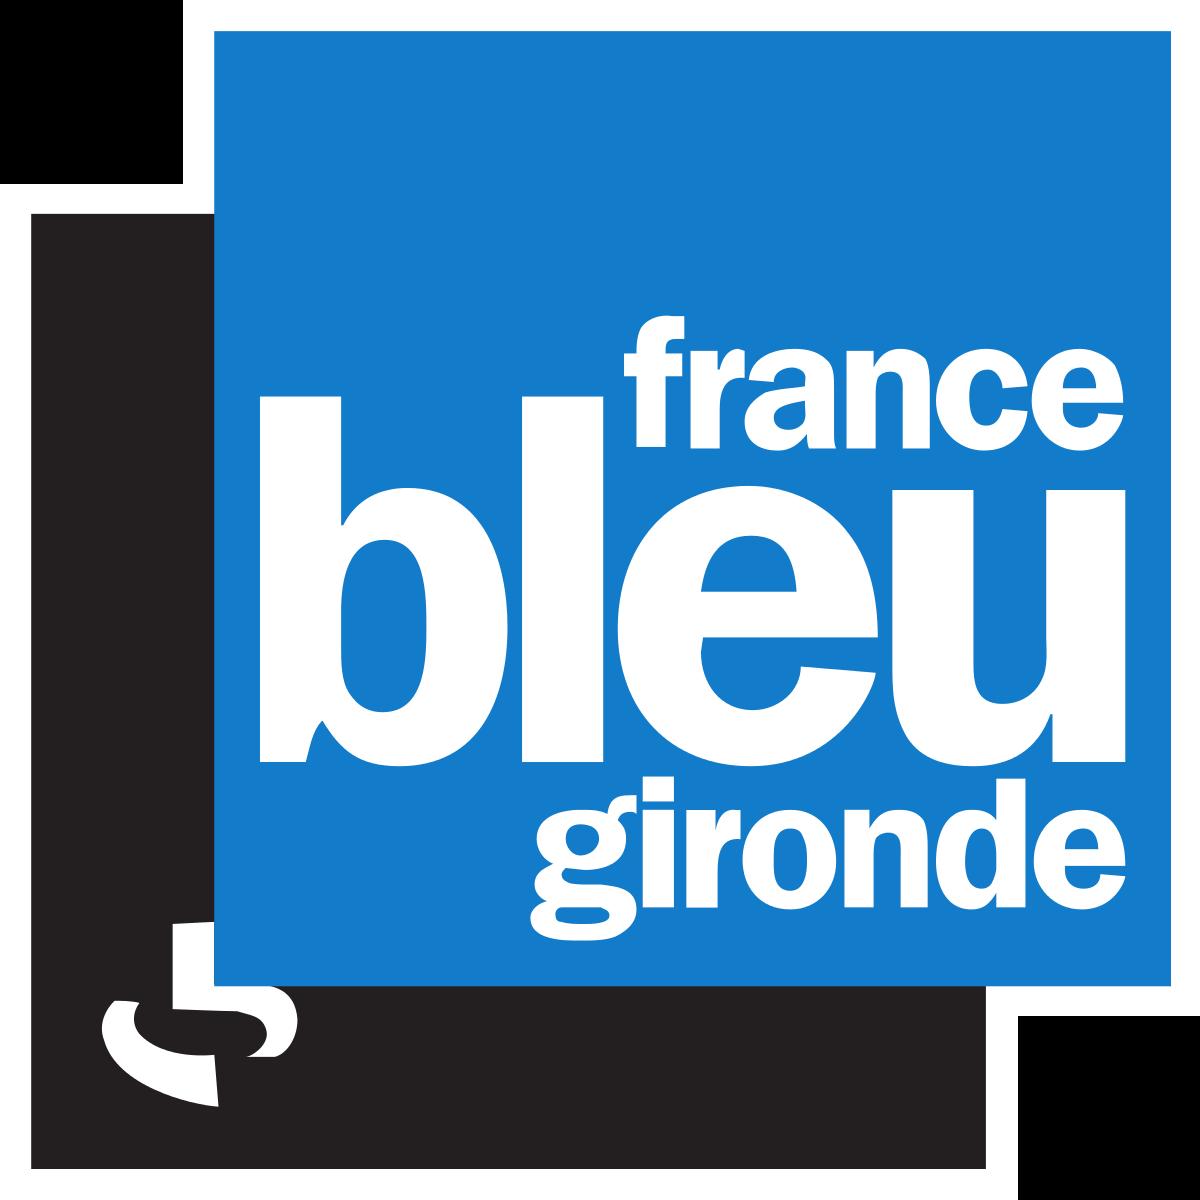 France_Bleu_Gironde_logo_2015-svg.png